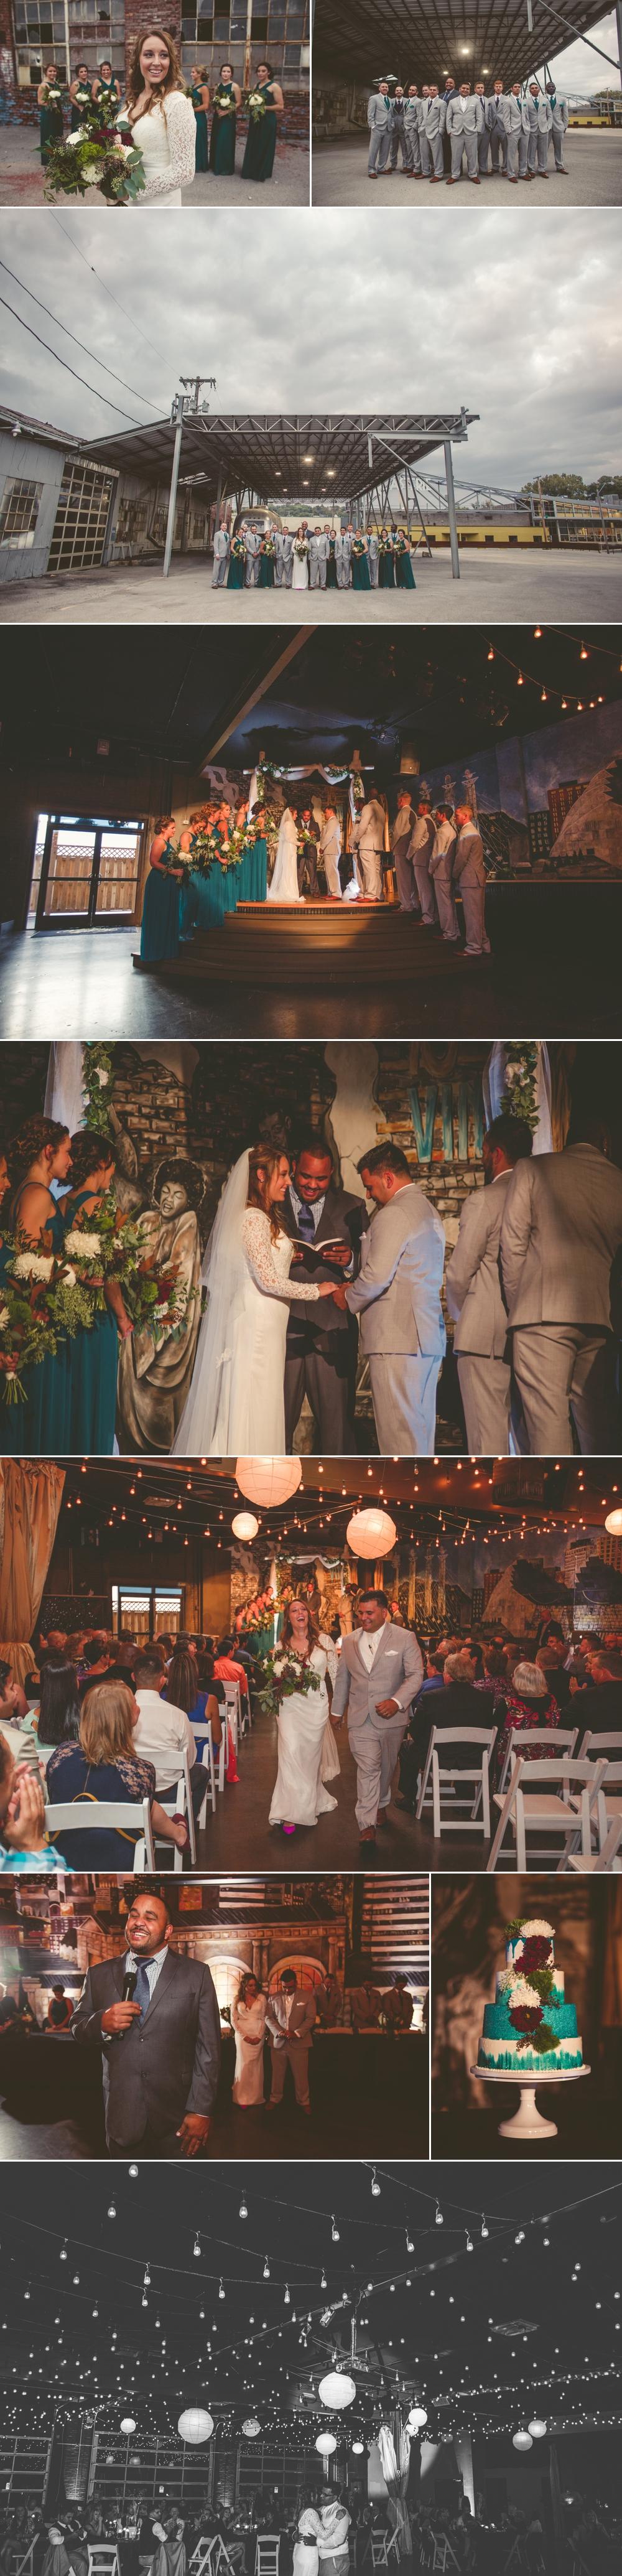 jason_domingues_photography_best_kansas_city_photographer_kc_weddings_28_event_space_0003